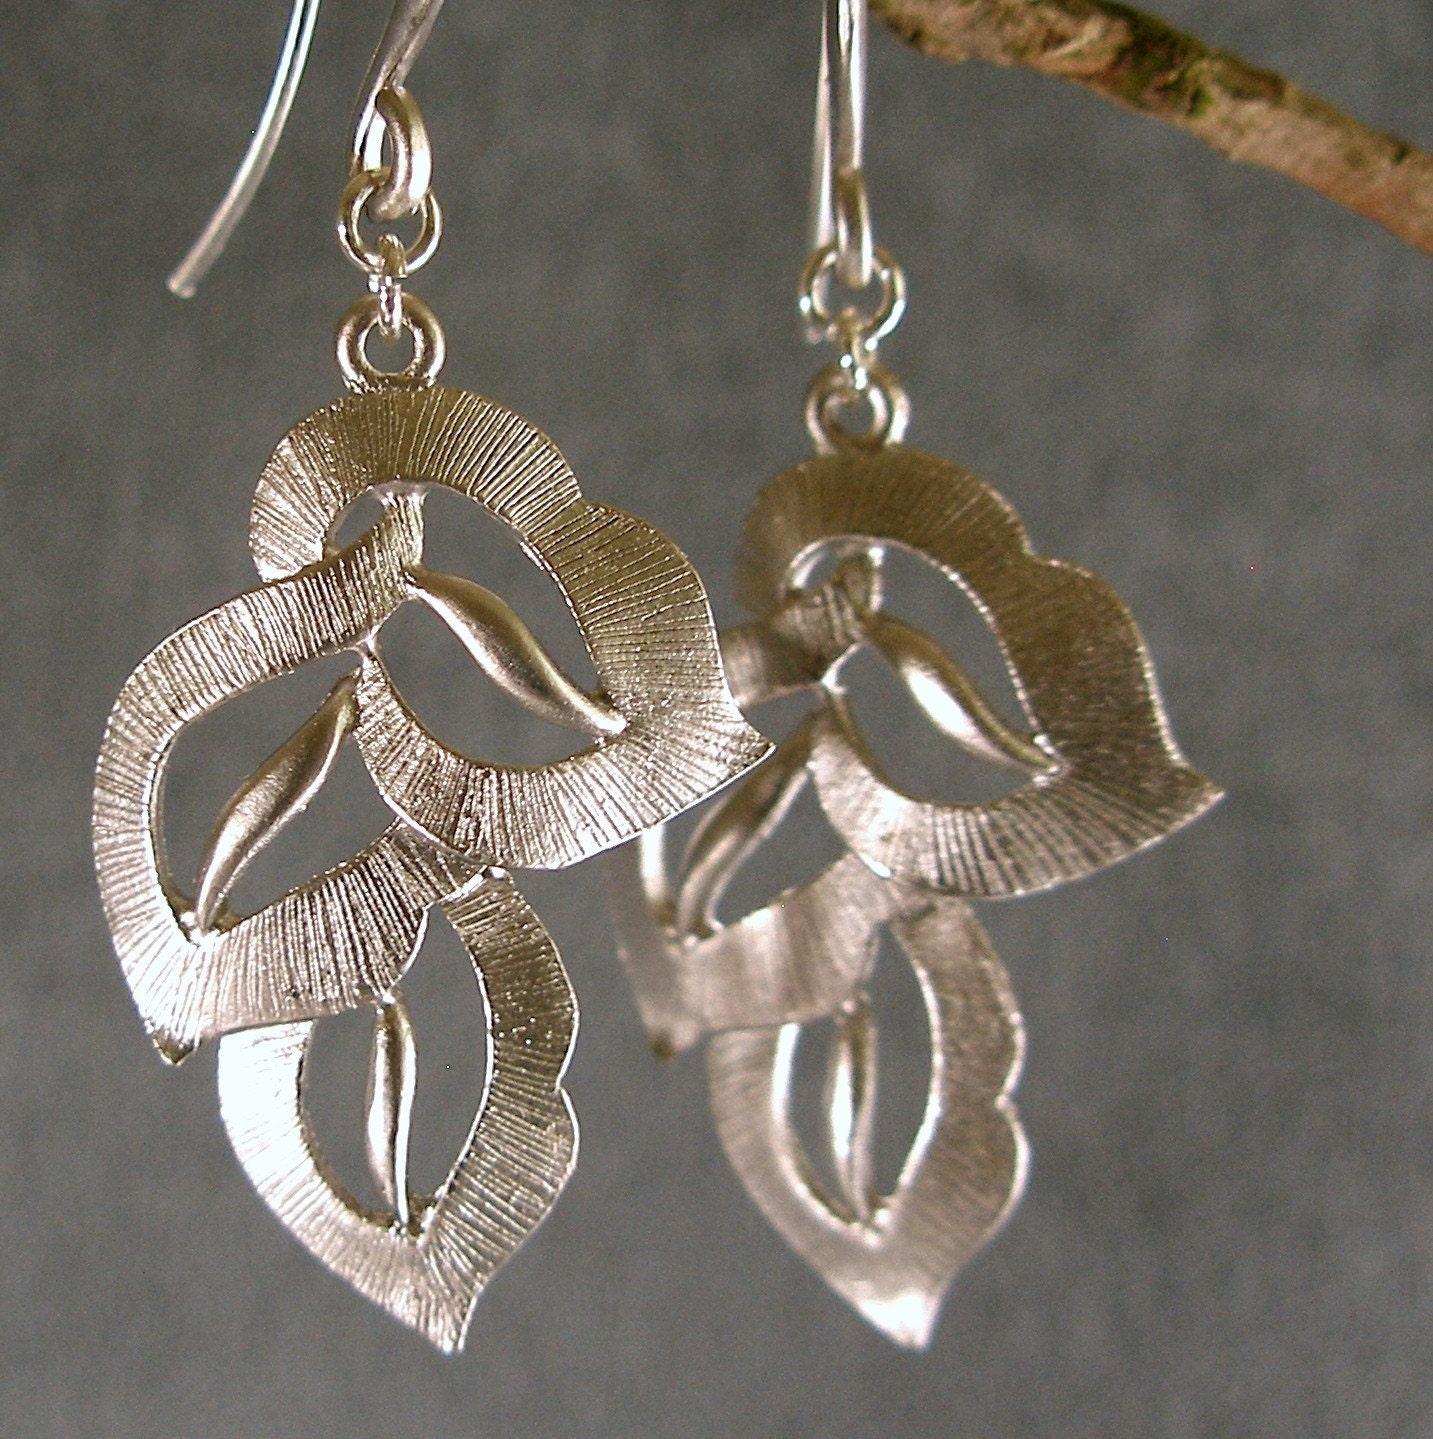 5 pair Silver Textured Leaves Bridesmaids' Earrings (415-940R)